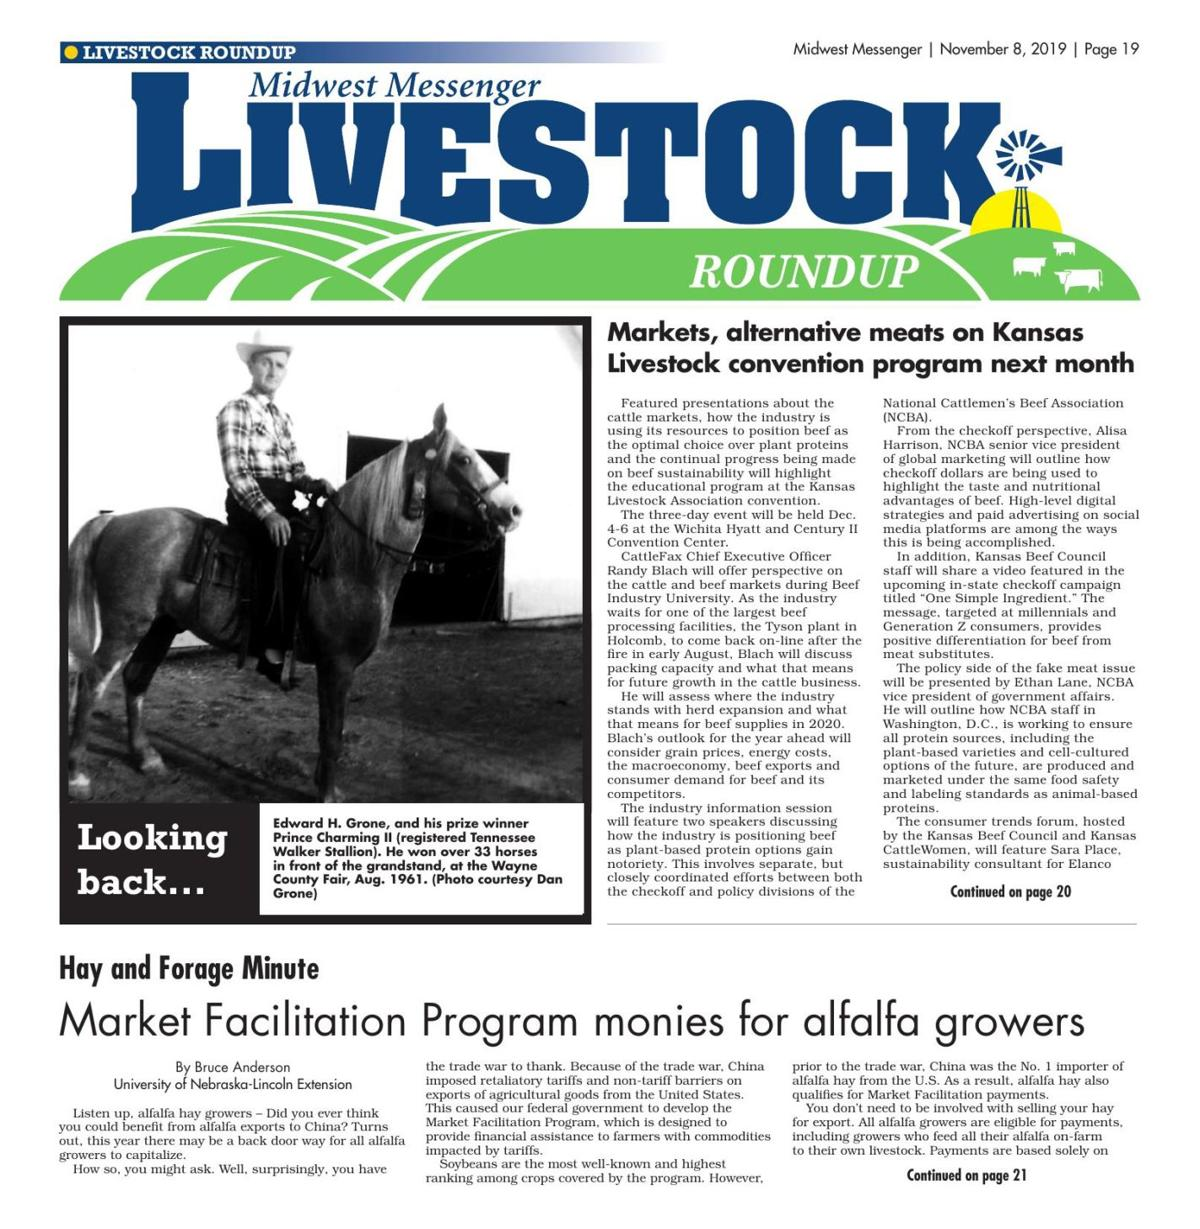 Livestock Roundup 11/8/19